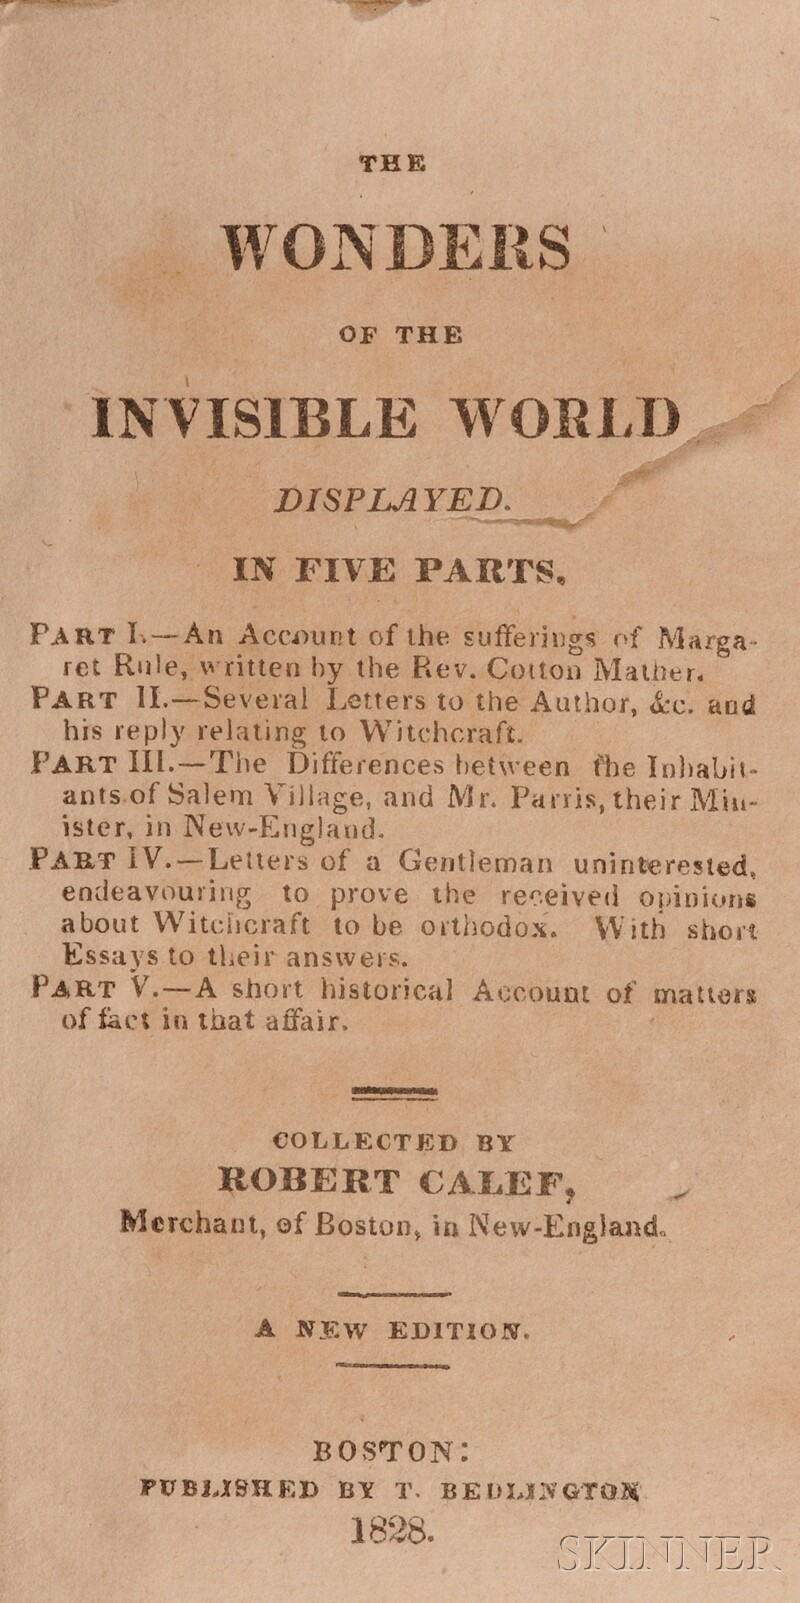 (Witchcraft), Calef, Robert (1648-1719) & Mather, Cotton (1663-1728)